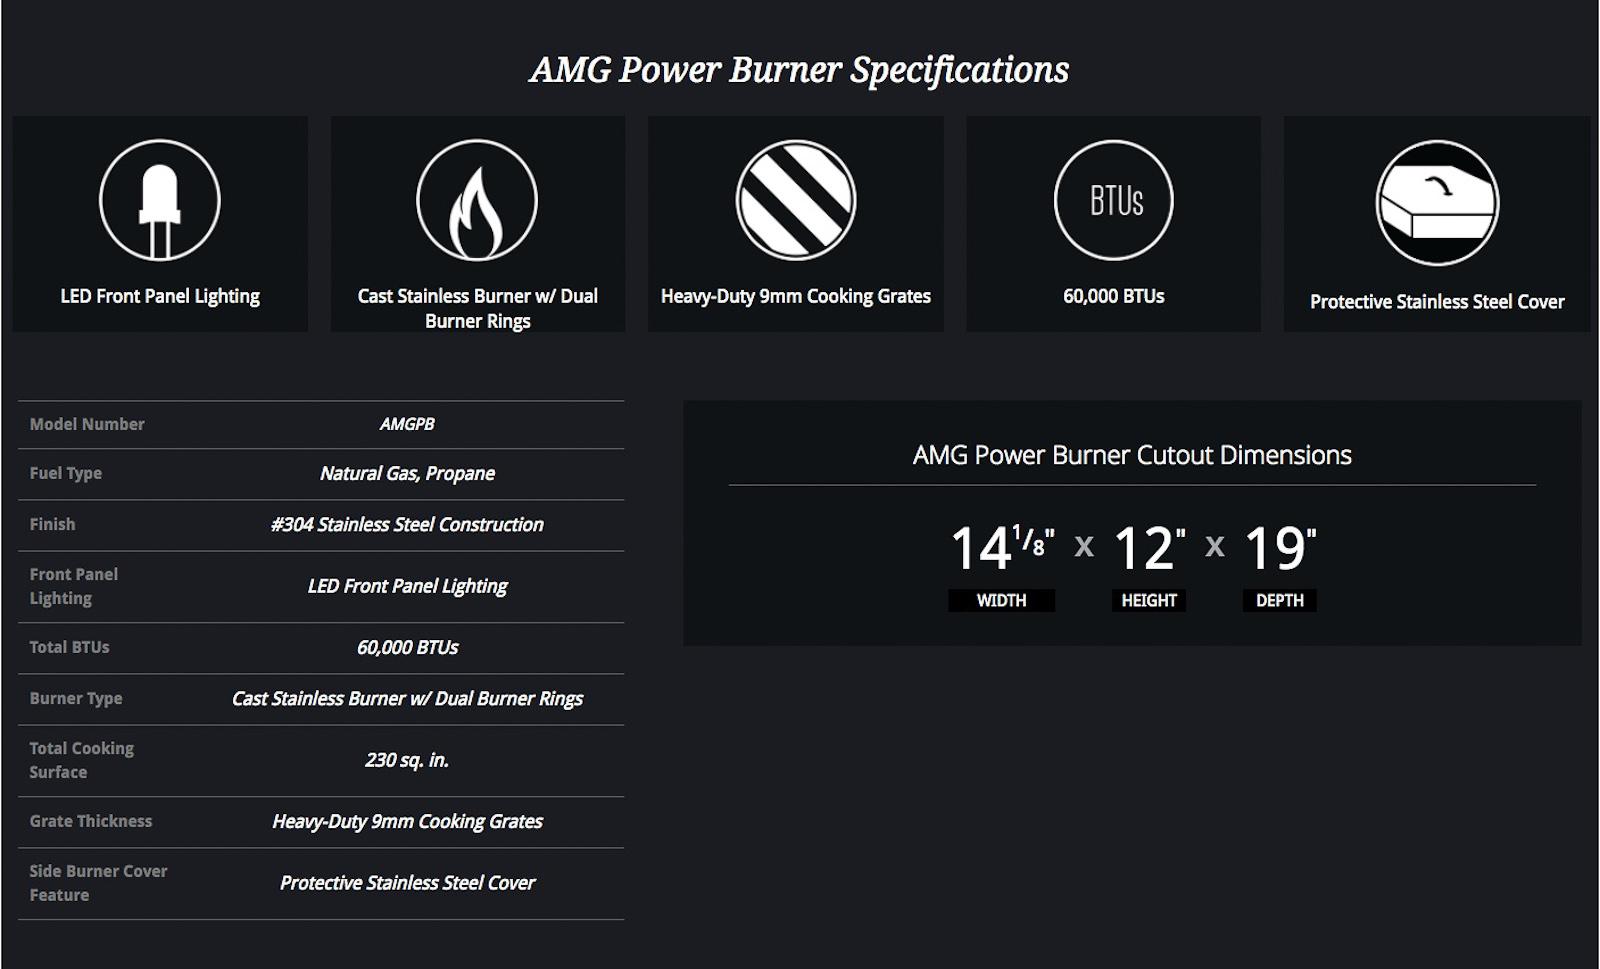 american-muscle-grill-power-burner-amgpb.jpg